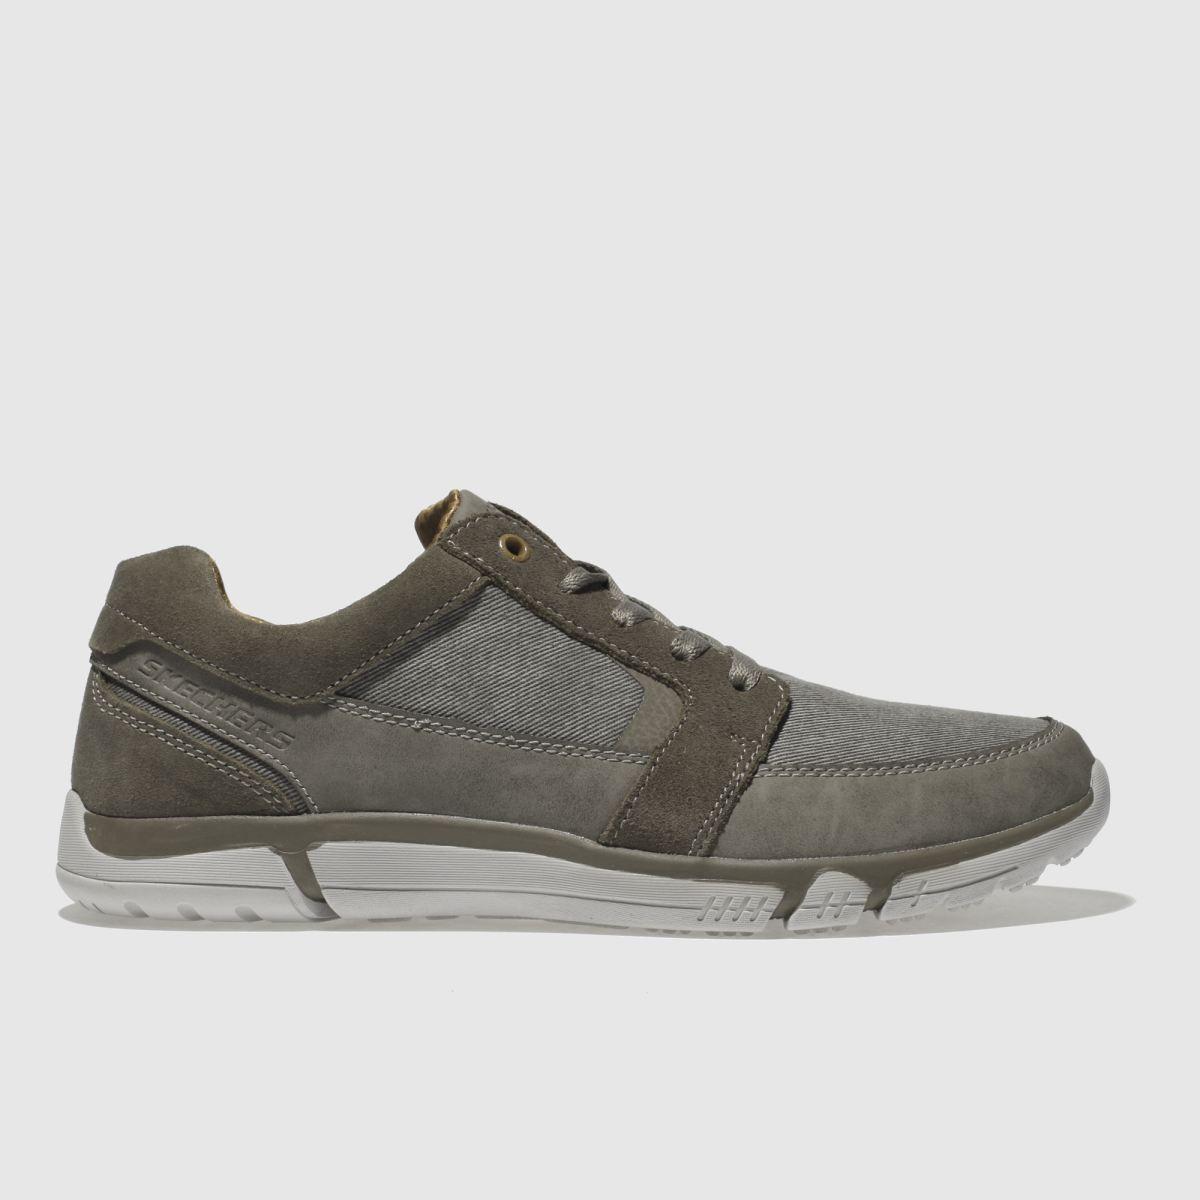 Skechers Grey Edmen Ristone Shoes